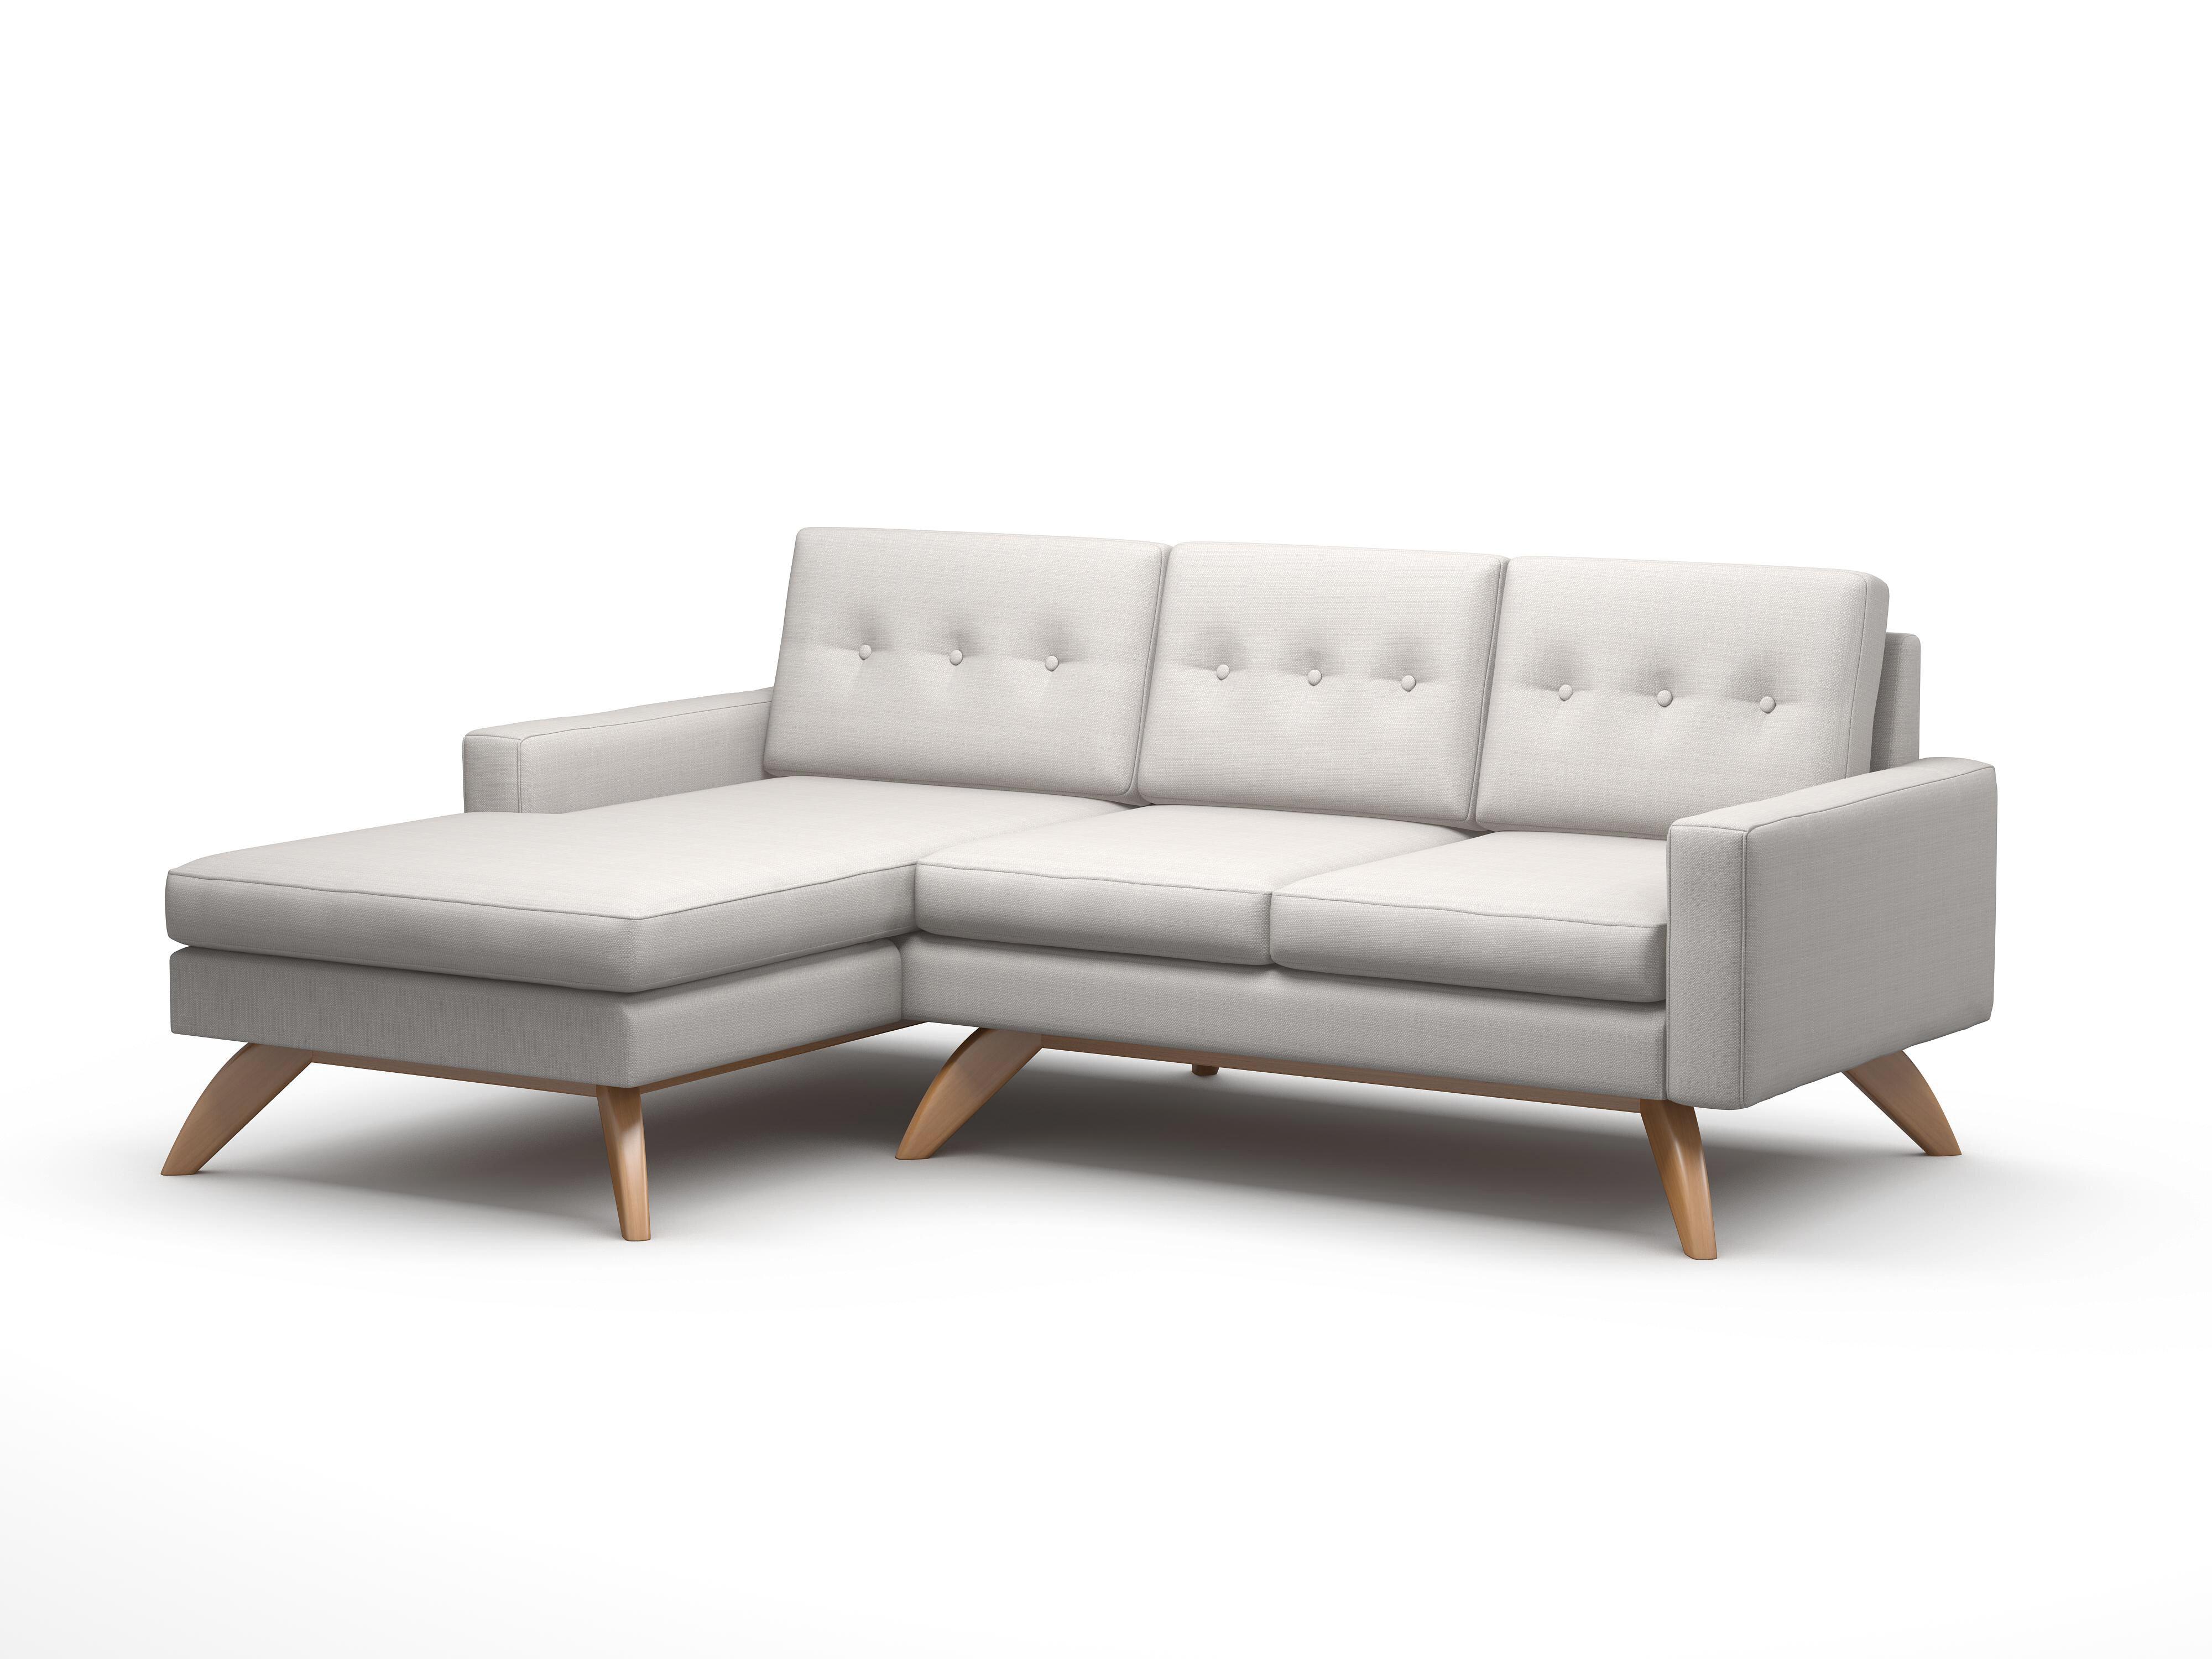 Truemodern luna 90 sofa with chaise wayfair